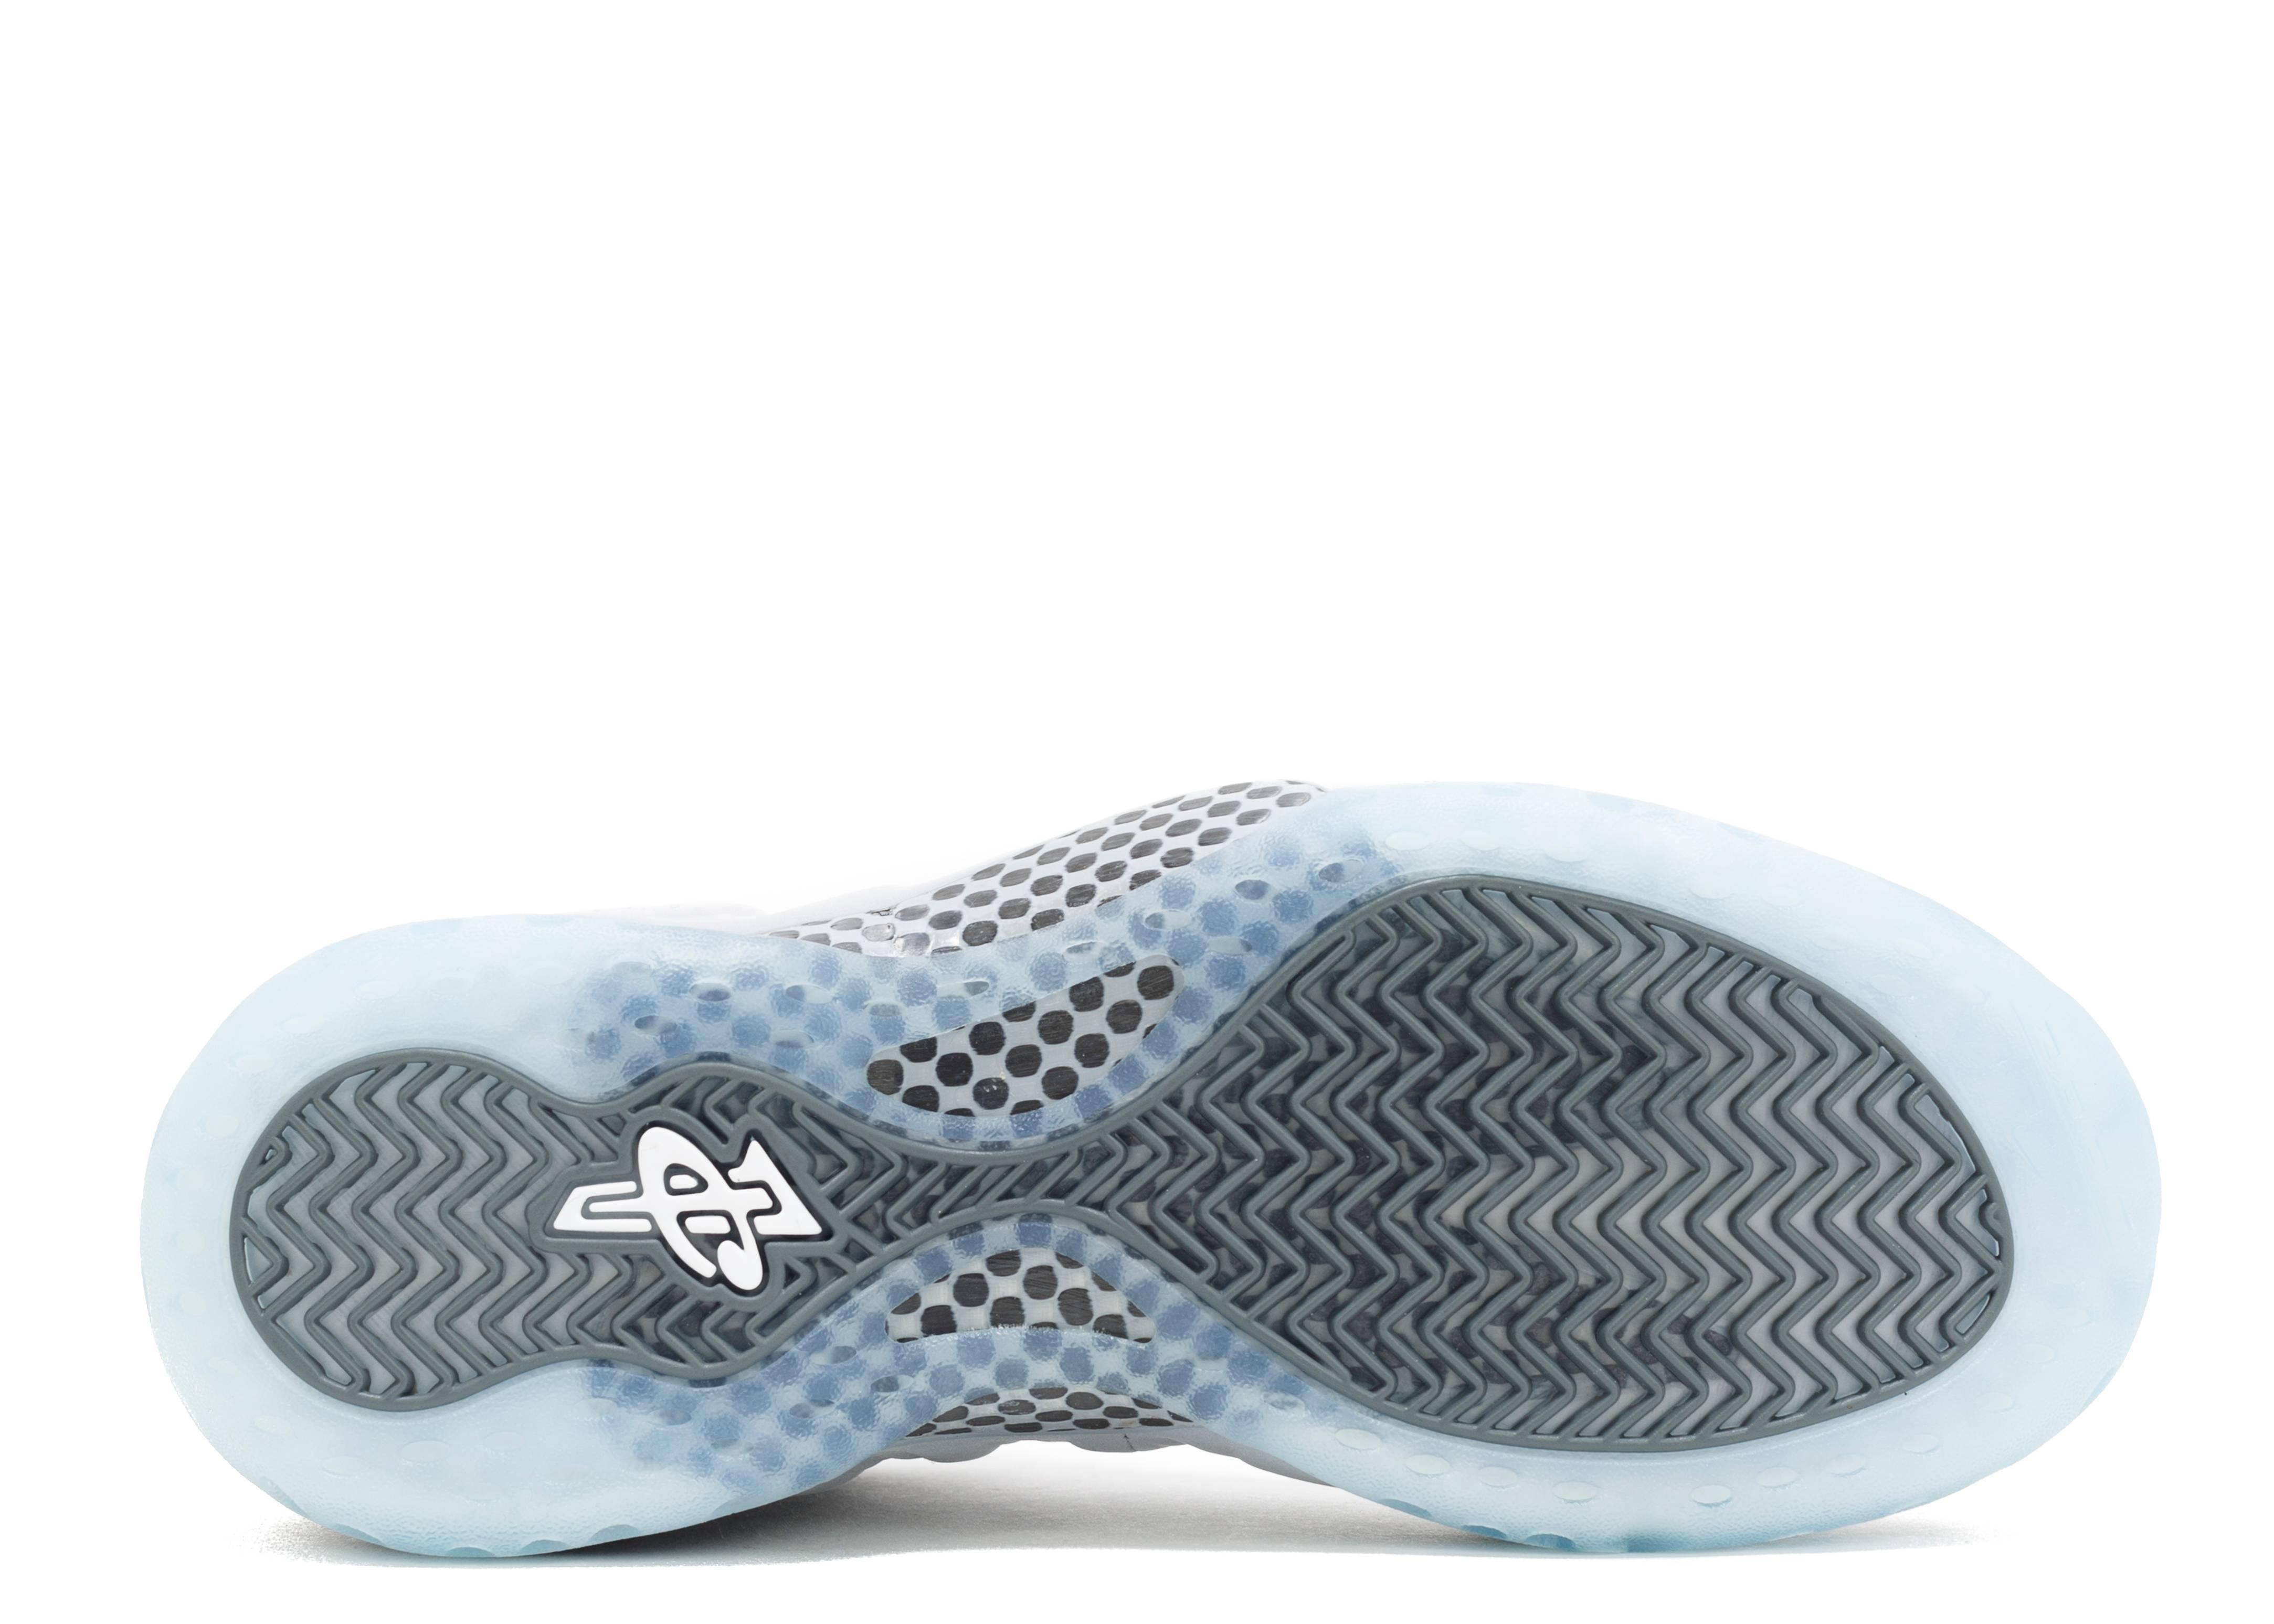 online retailer 7e68b 601da Air Foamposite One Prm - Nike - 575420 007 - wolf grey white-cool grey-blk    Flight Club